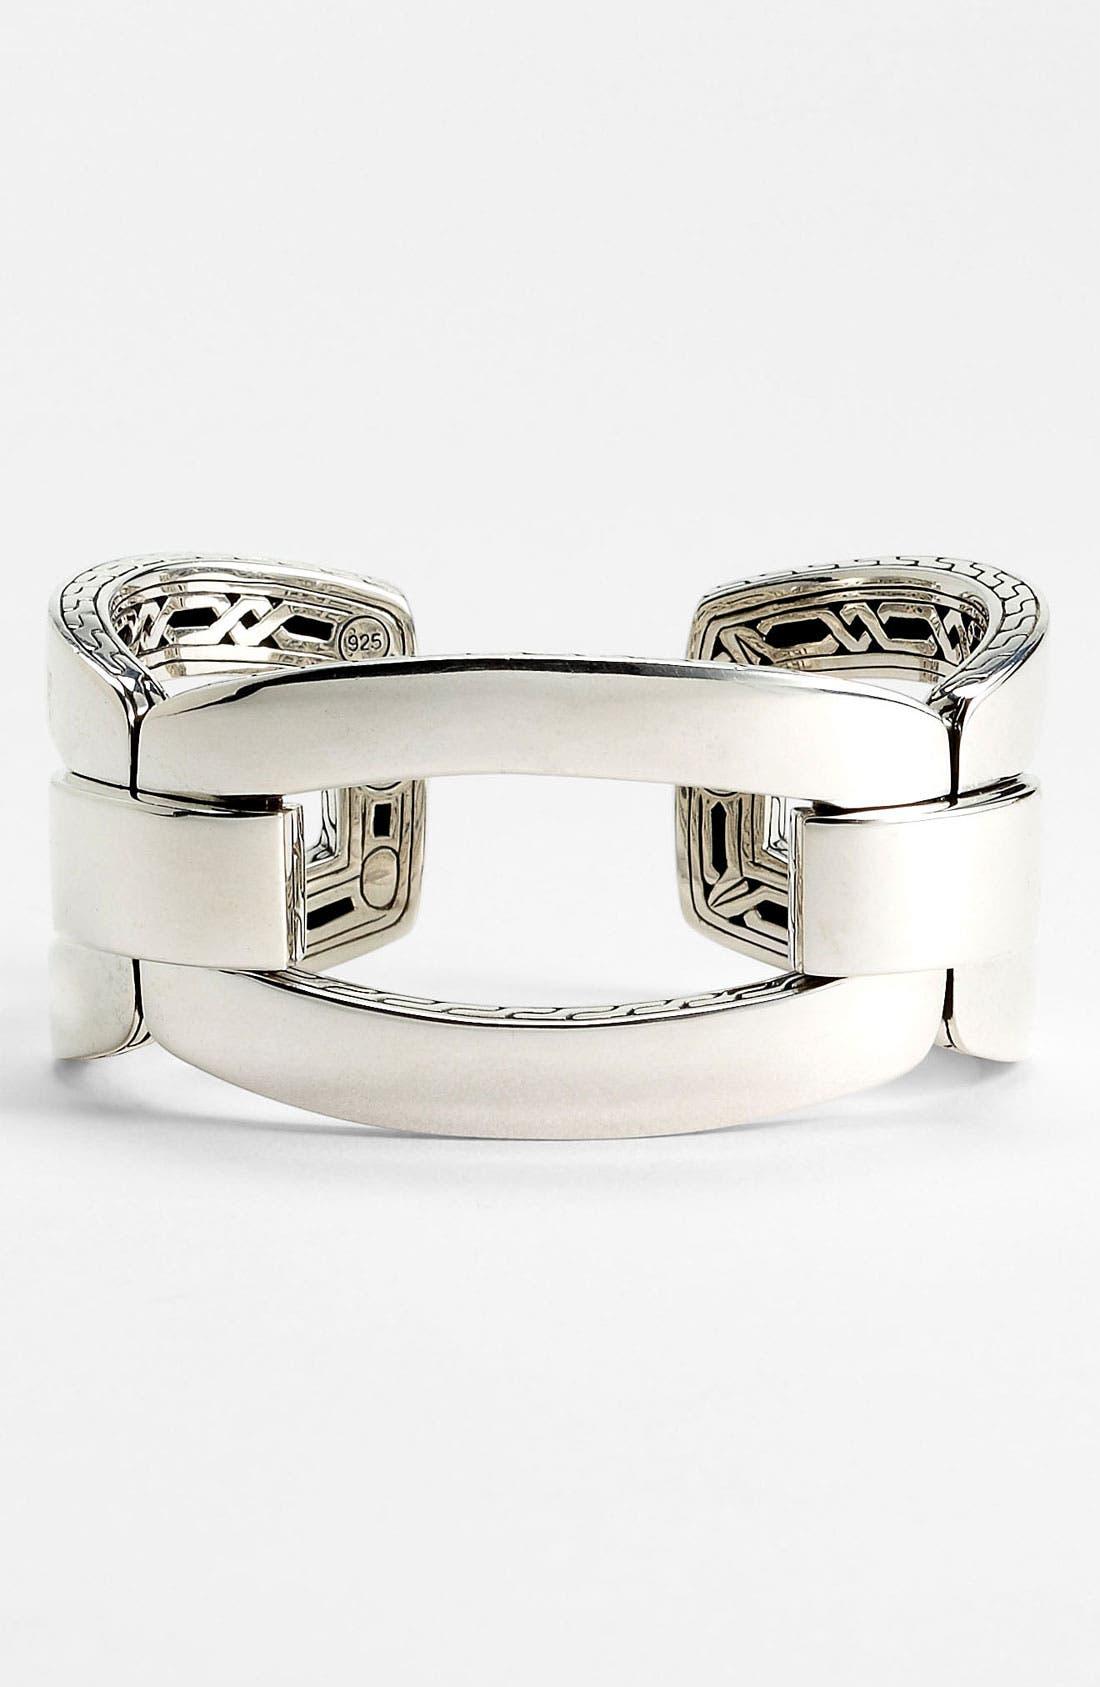 Main Image - John Hardy 'Classic Chain' Link Cuff